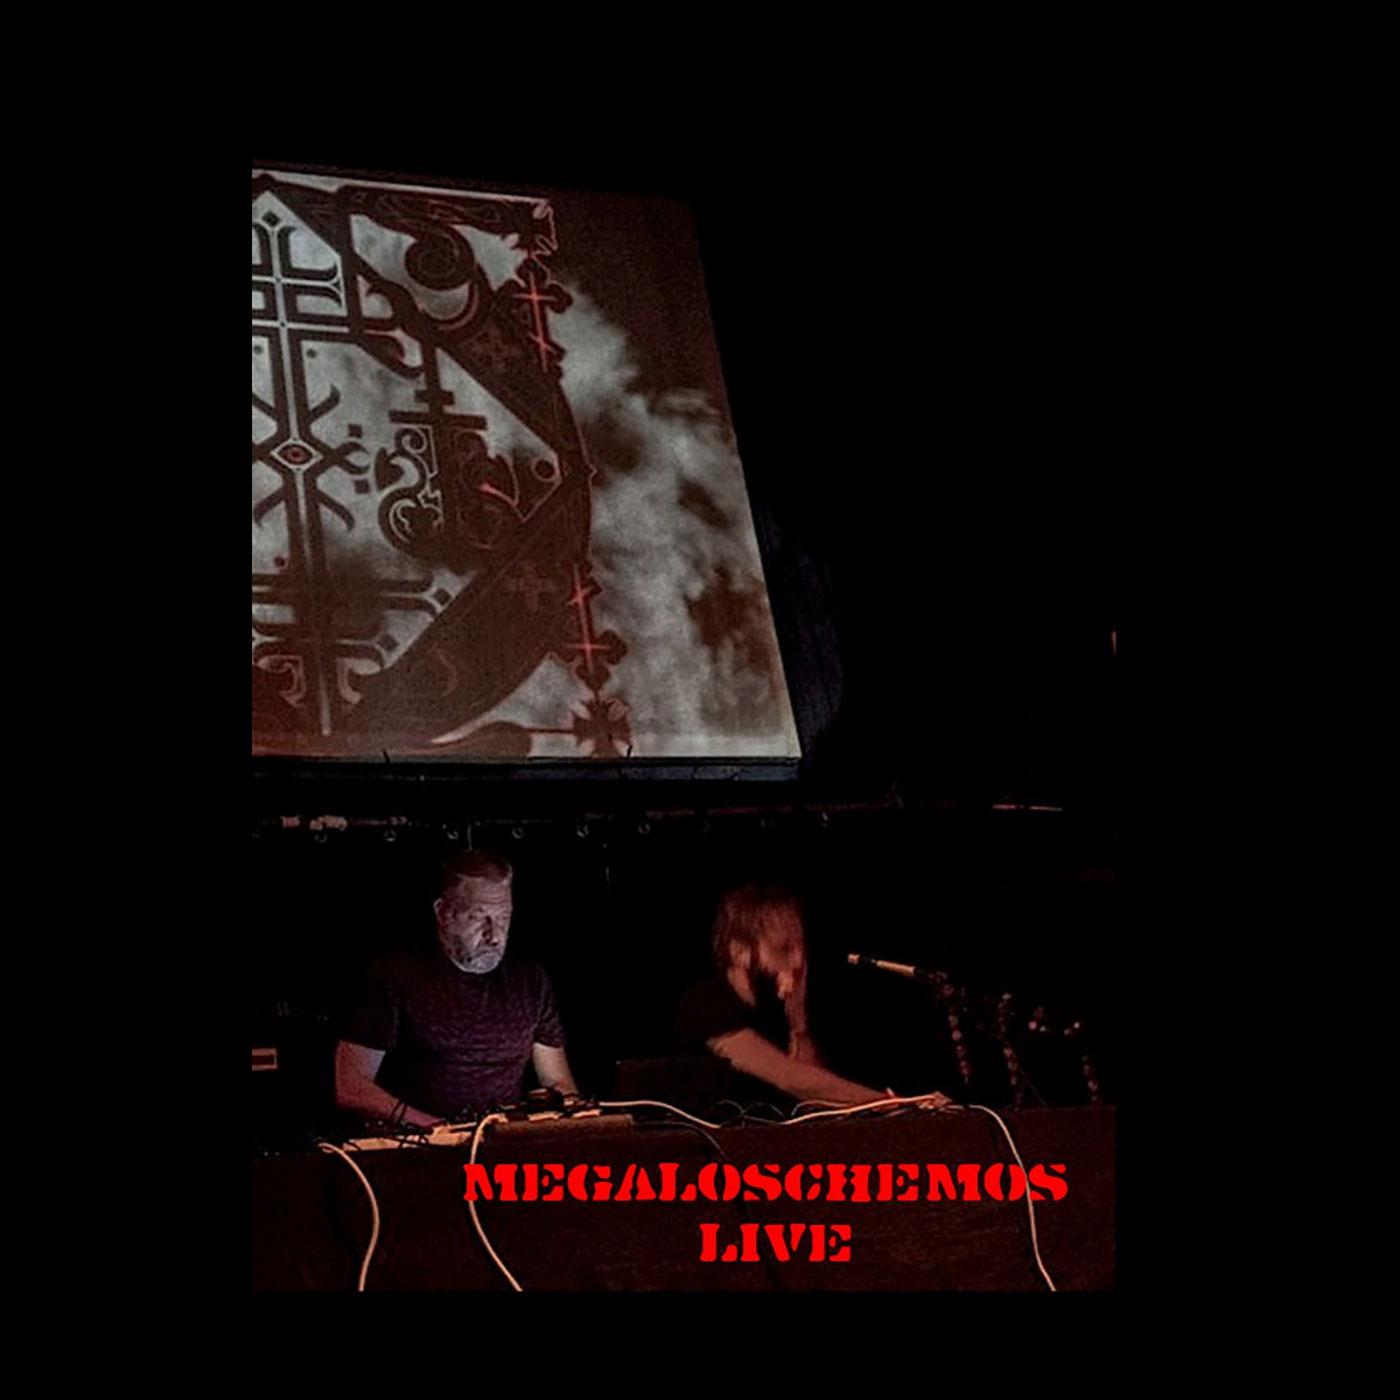 Abattoir & Satori – Megaloschemos Live CS (Unsigned)